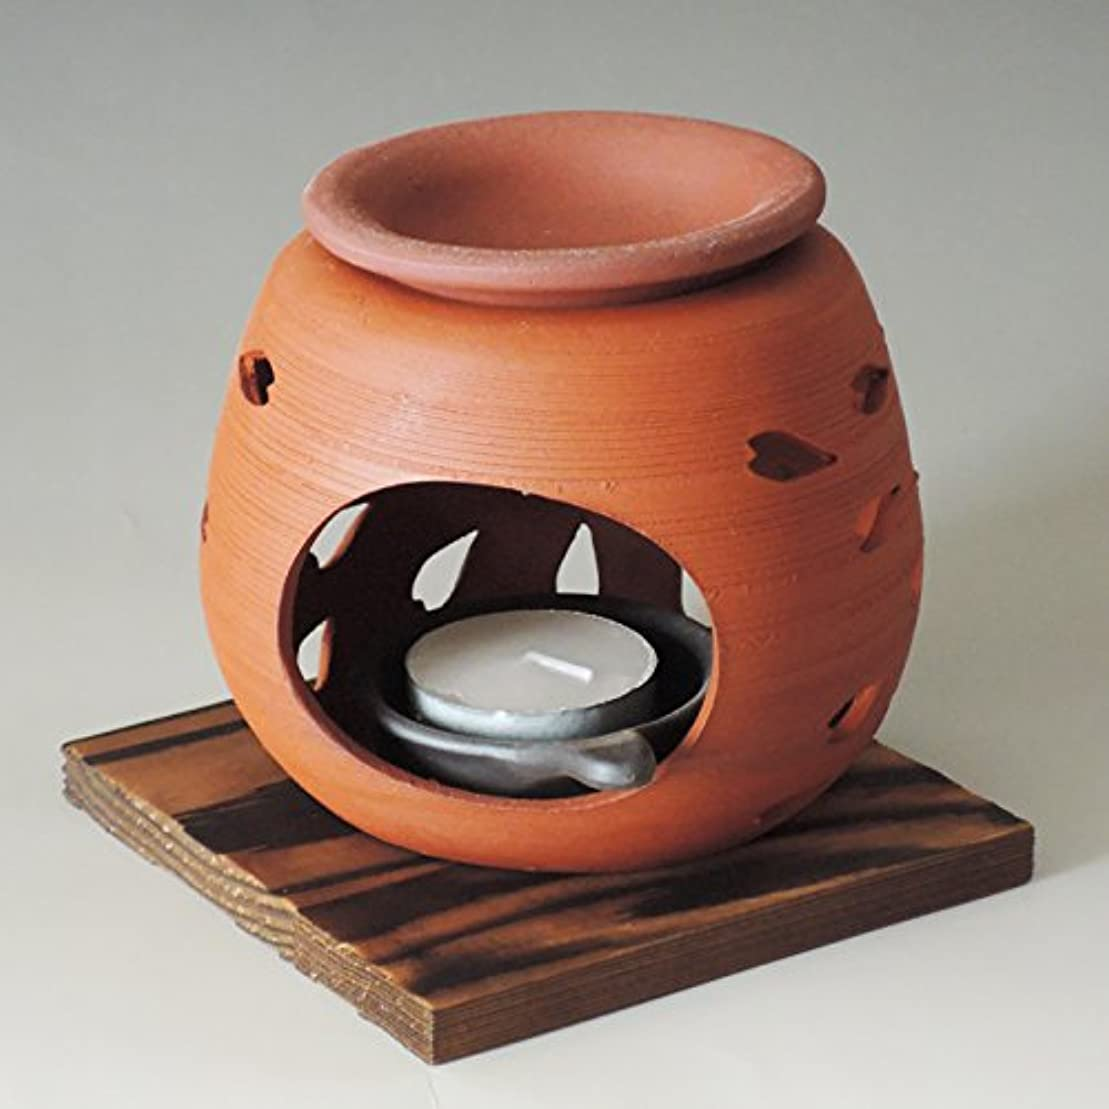 挽く平凡革命茶香炉 常滑焼 石龍作「花びら」川本屋茶舗